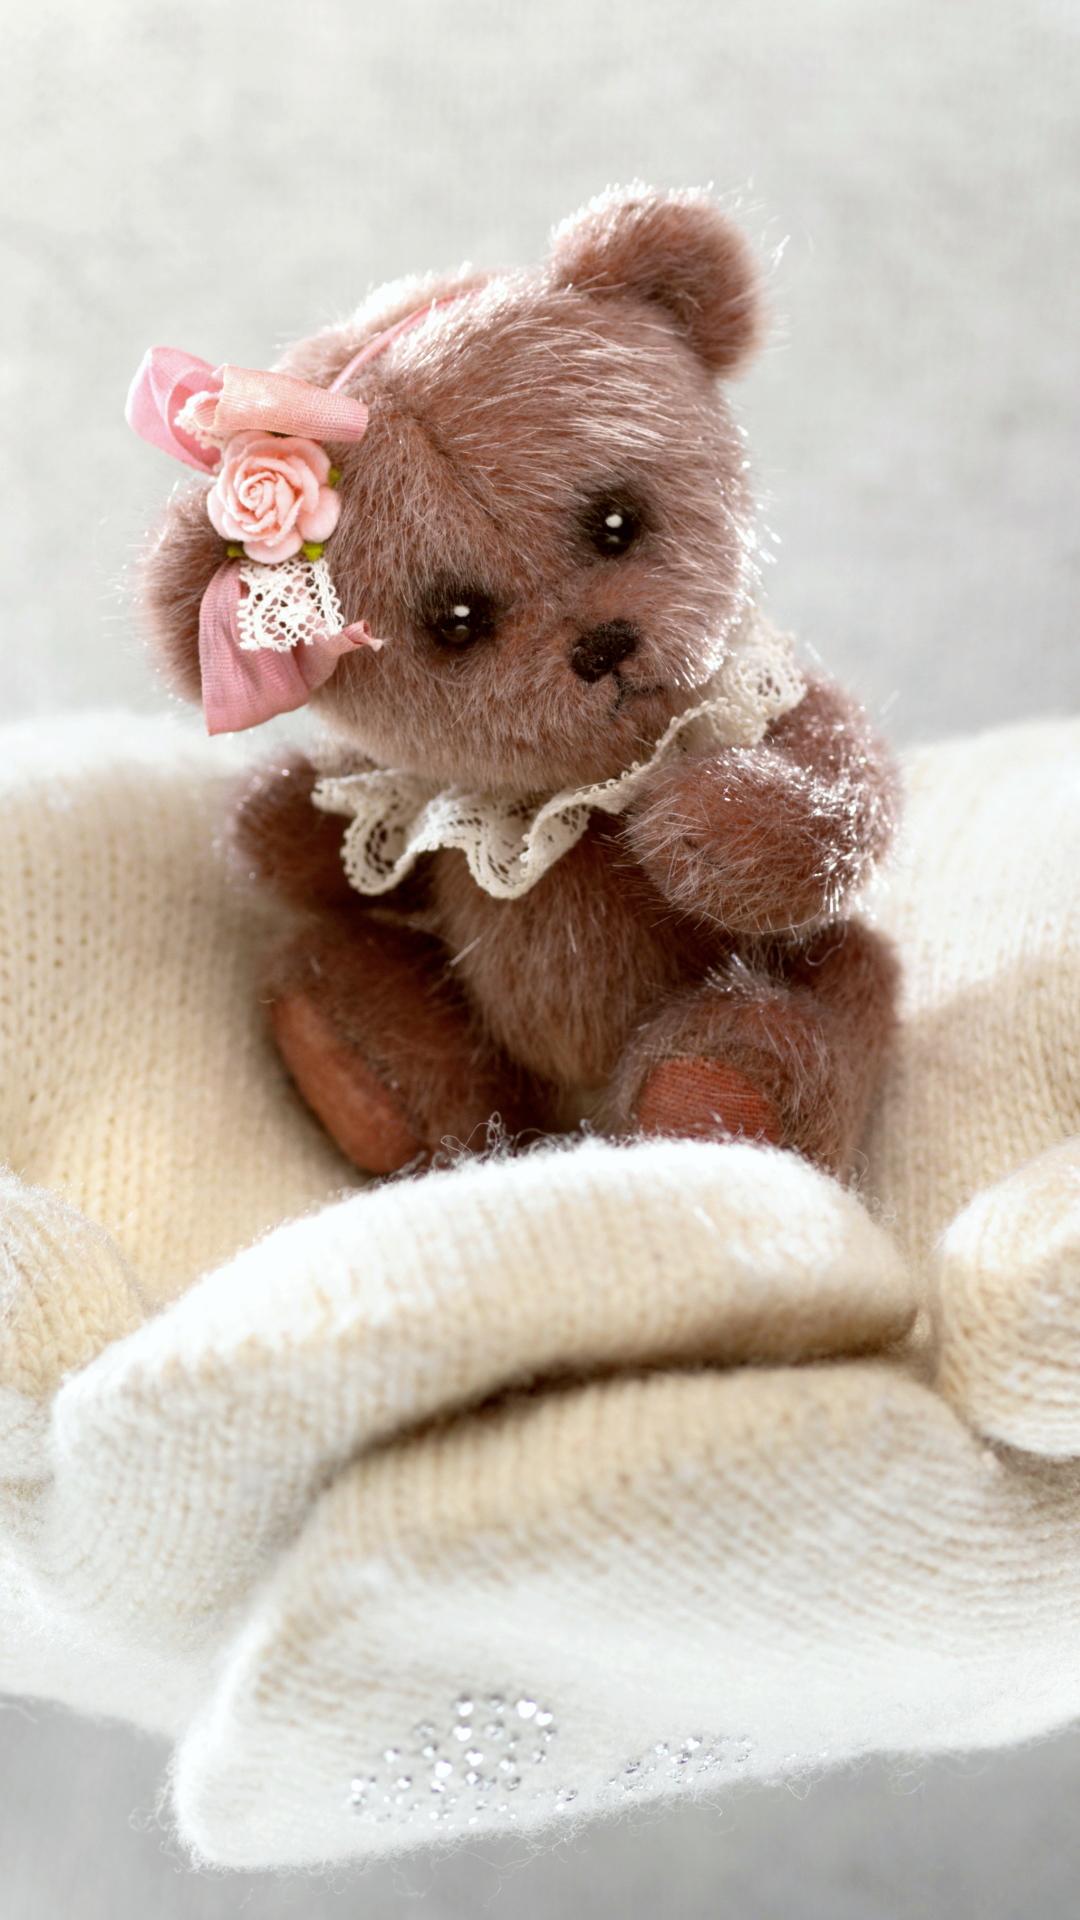 Beautiful Wallpaper Mobile Teddy Bear - 624734  You Should Have_51875.jpg